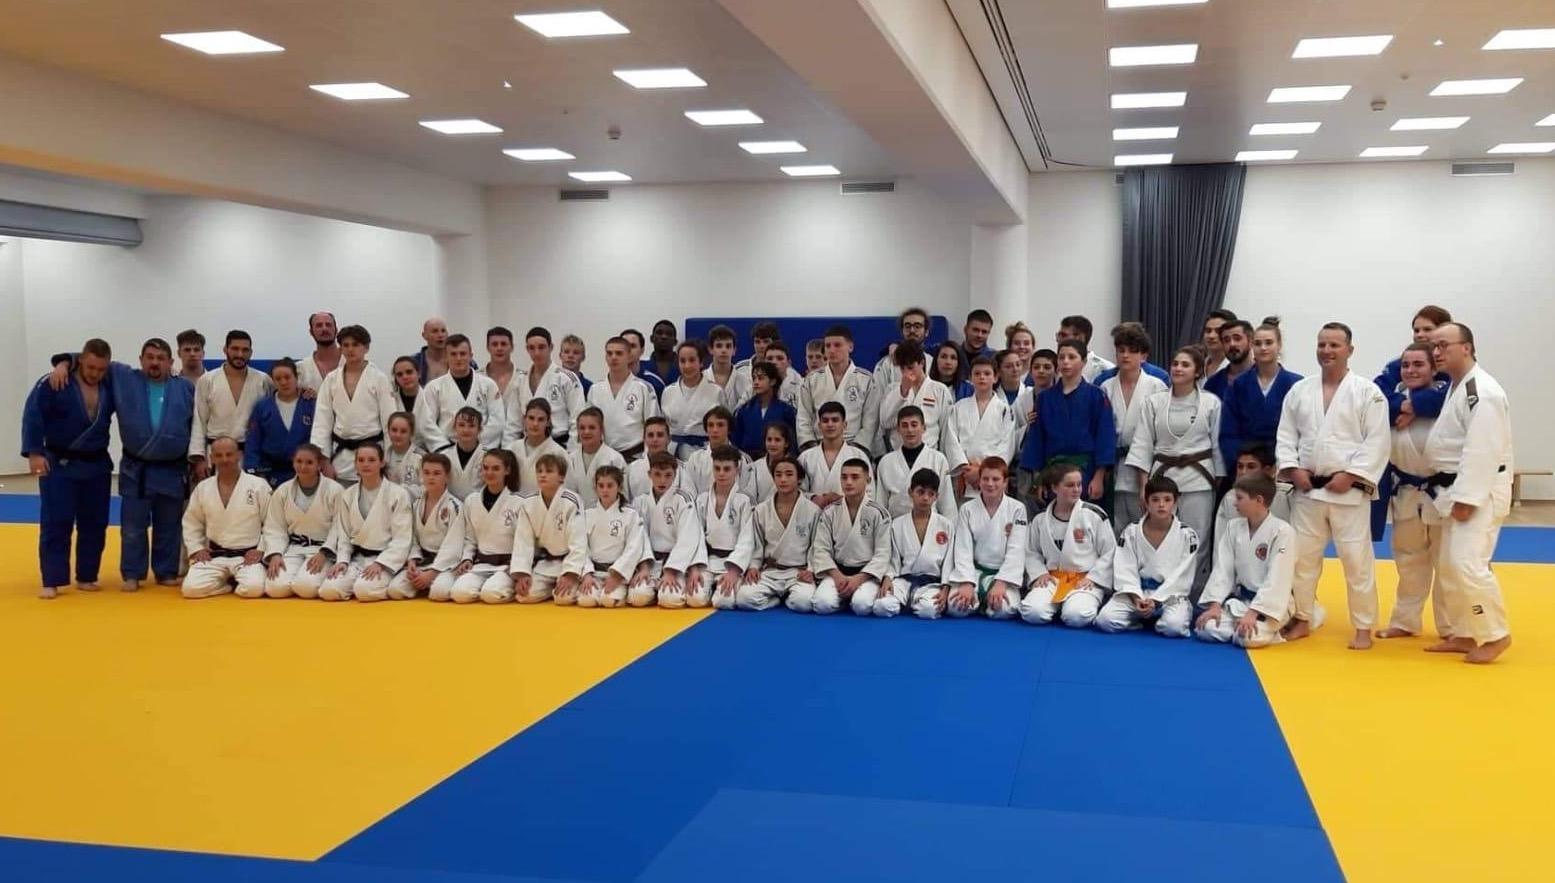 Interreg Judo Training - Luxembourg 02.12.2019